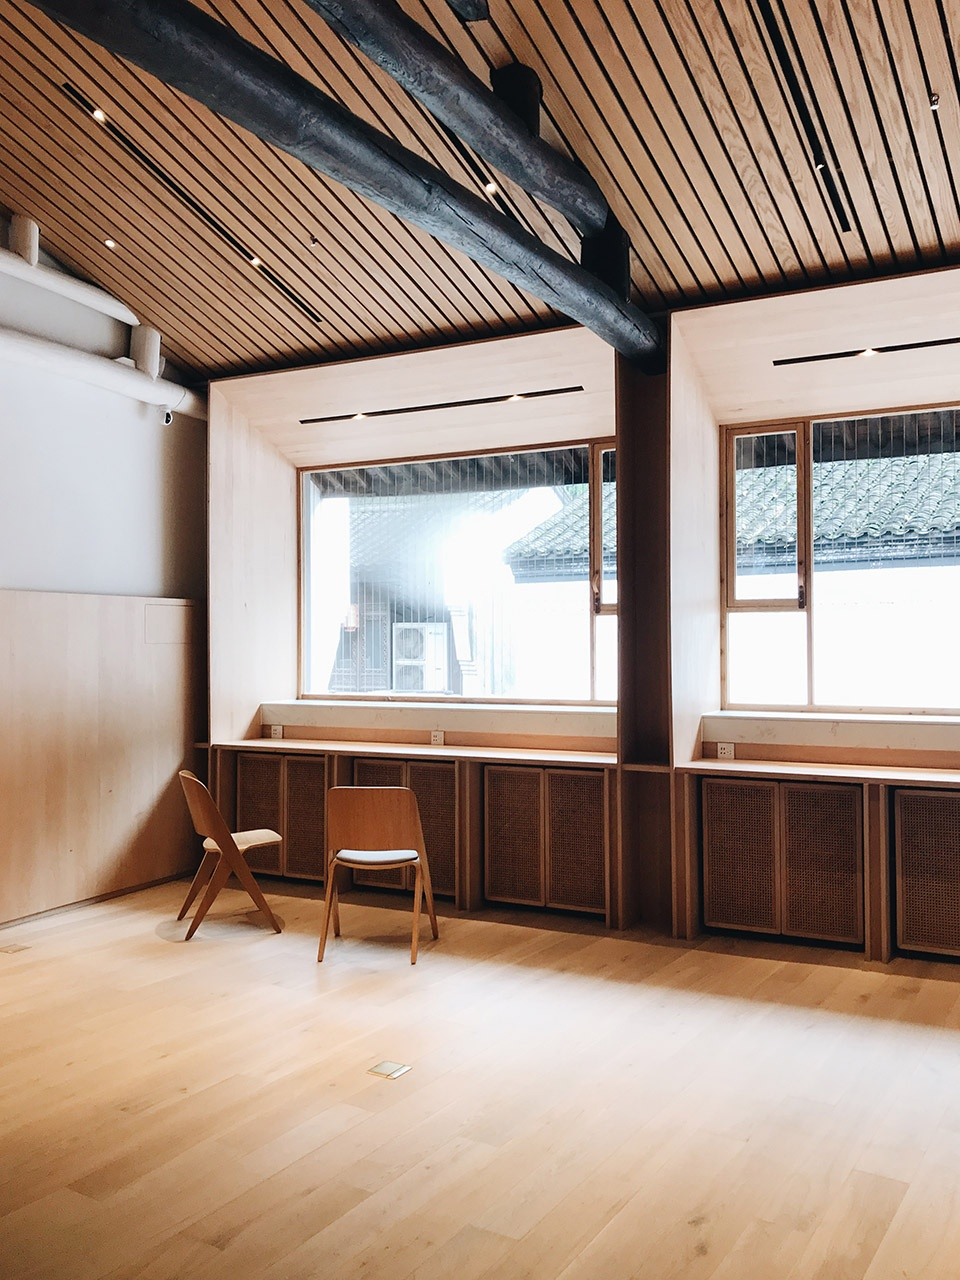 34-Random-Art-Space-Hnagzhou-by-AIR-Architects-960x1280.jpg